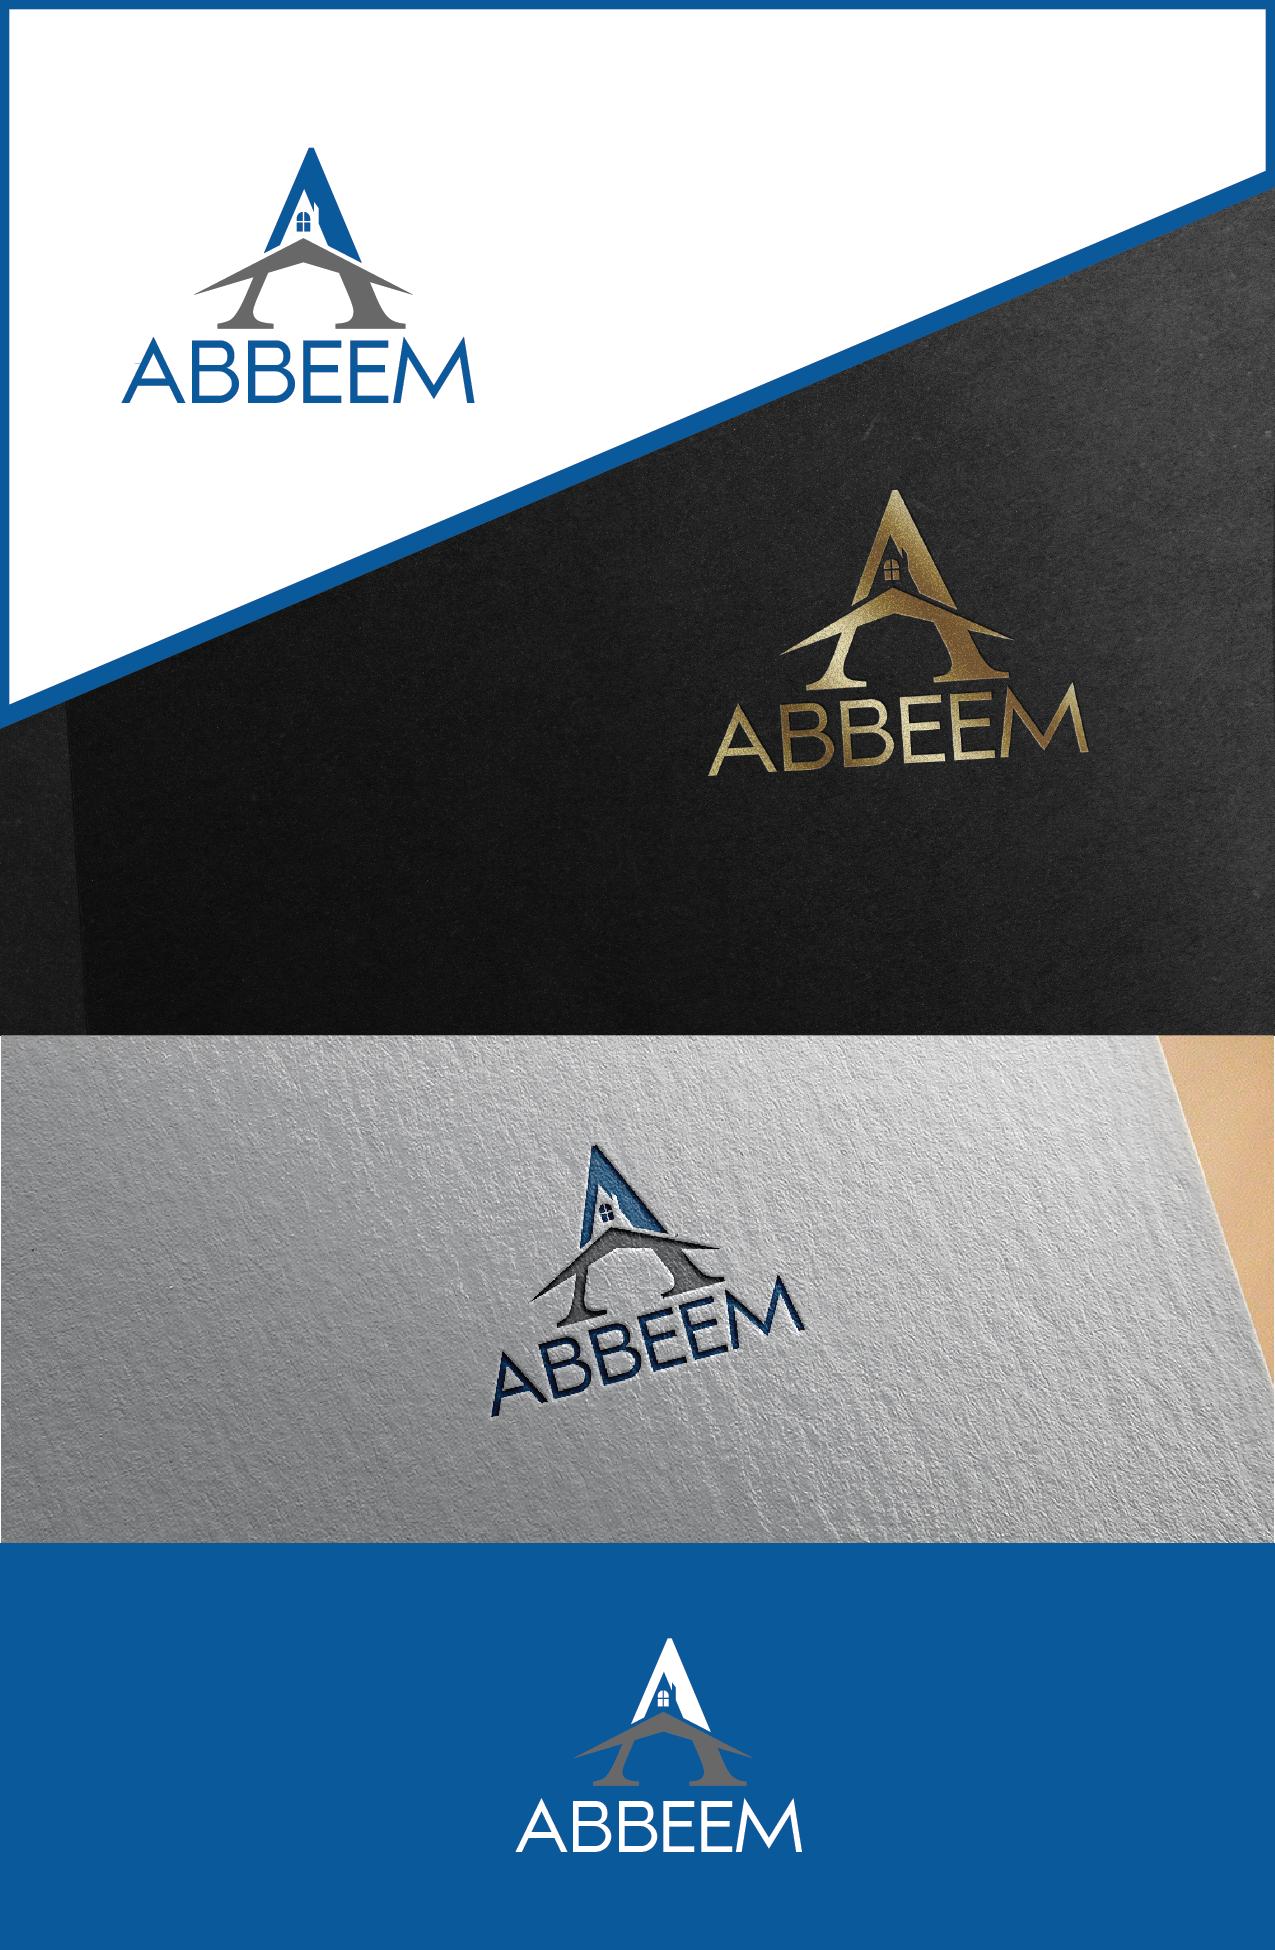 Logo Design by Private User - Entry No. 73 in the Logo Design Contest Luxury Logo Design for Abbeem.